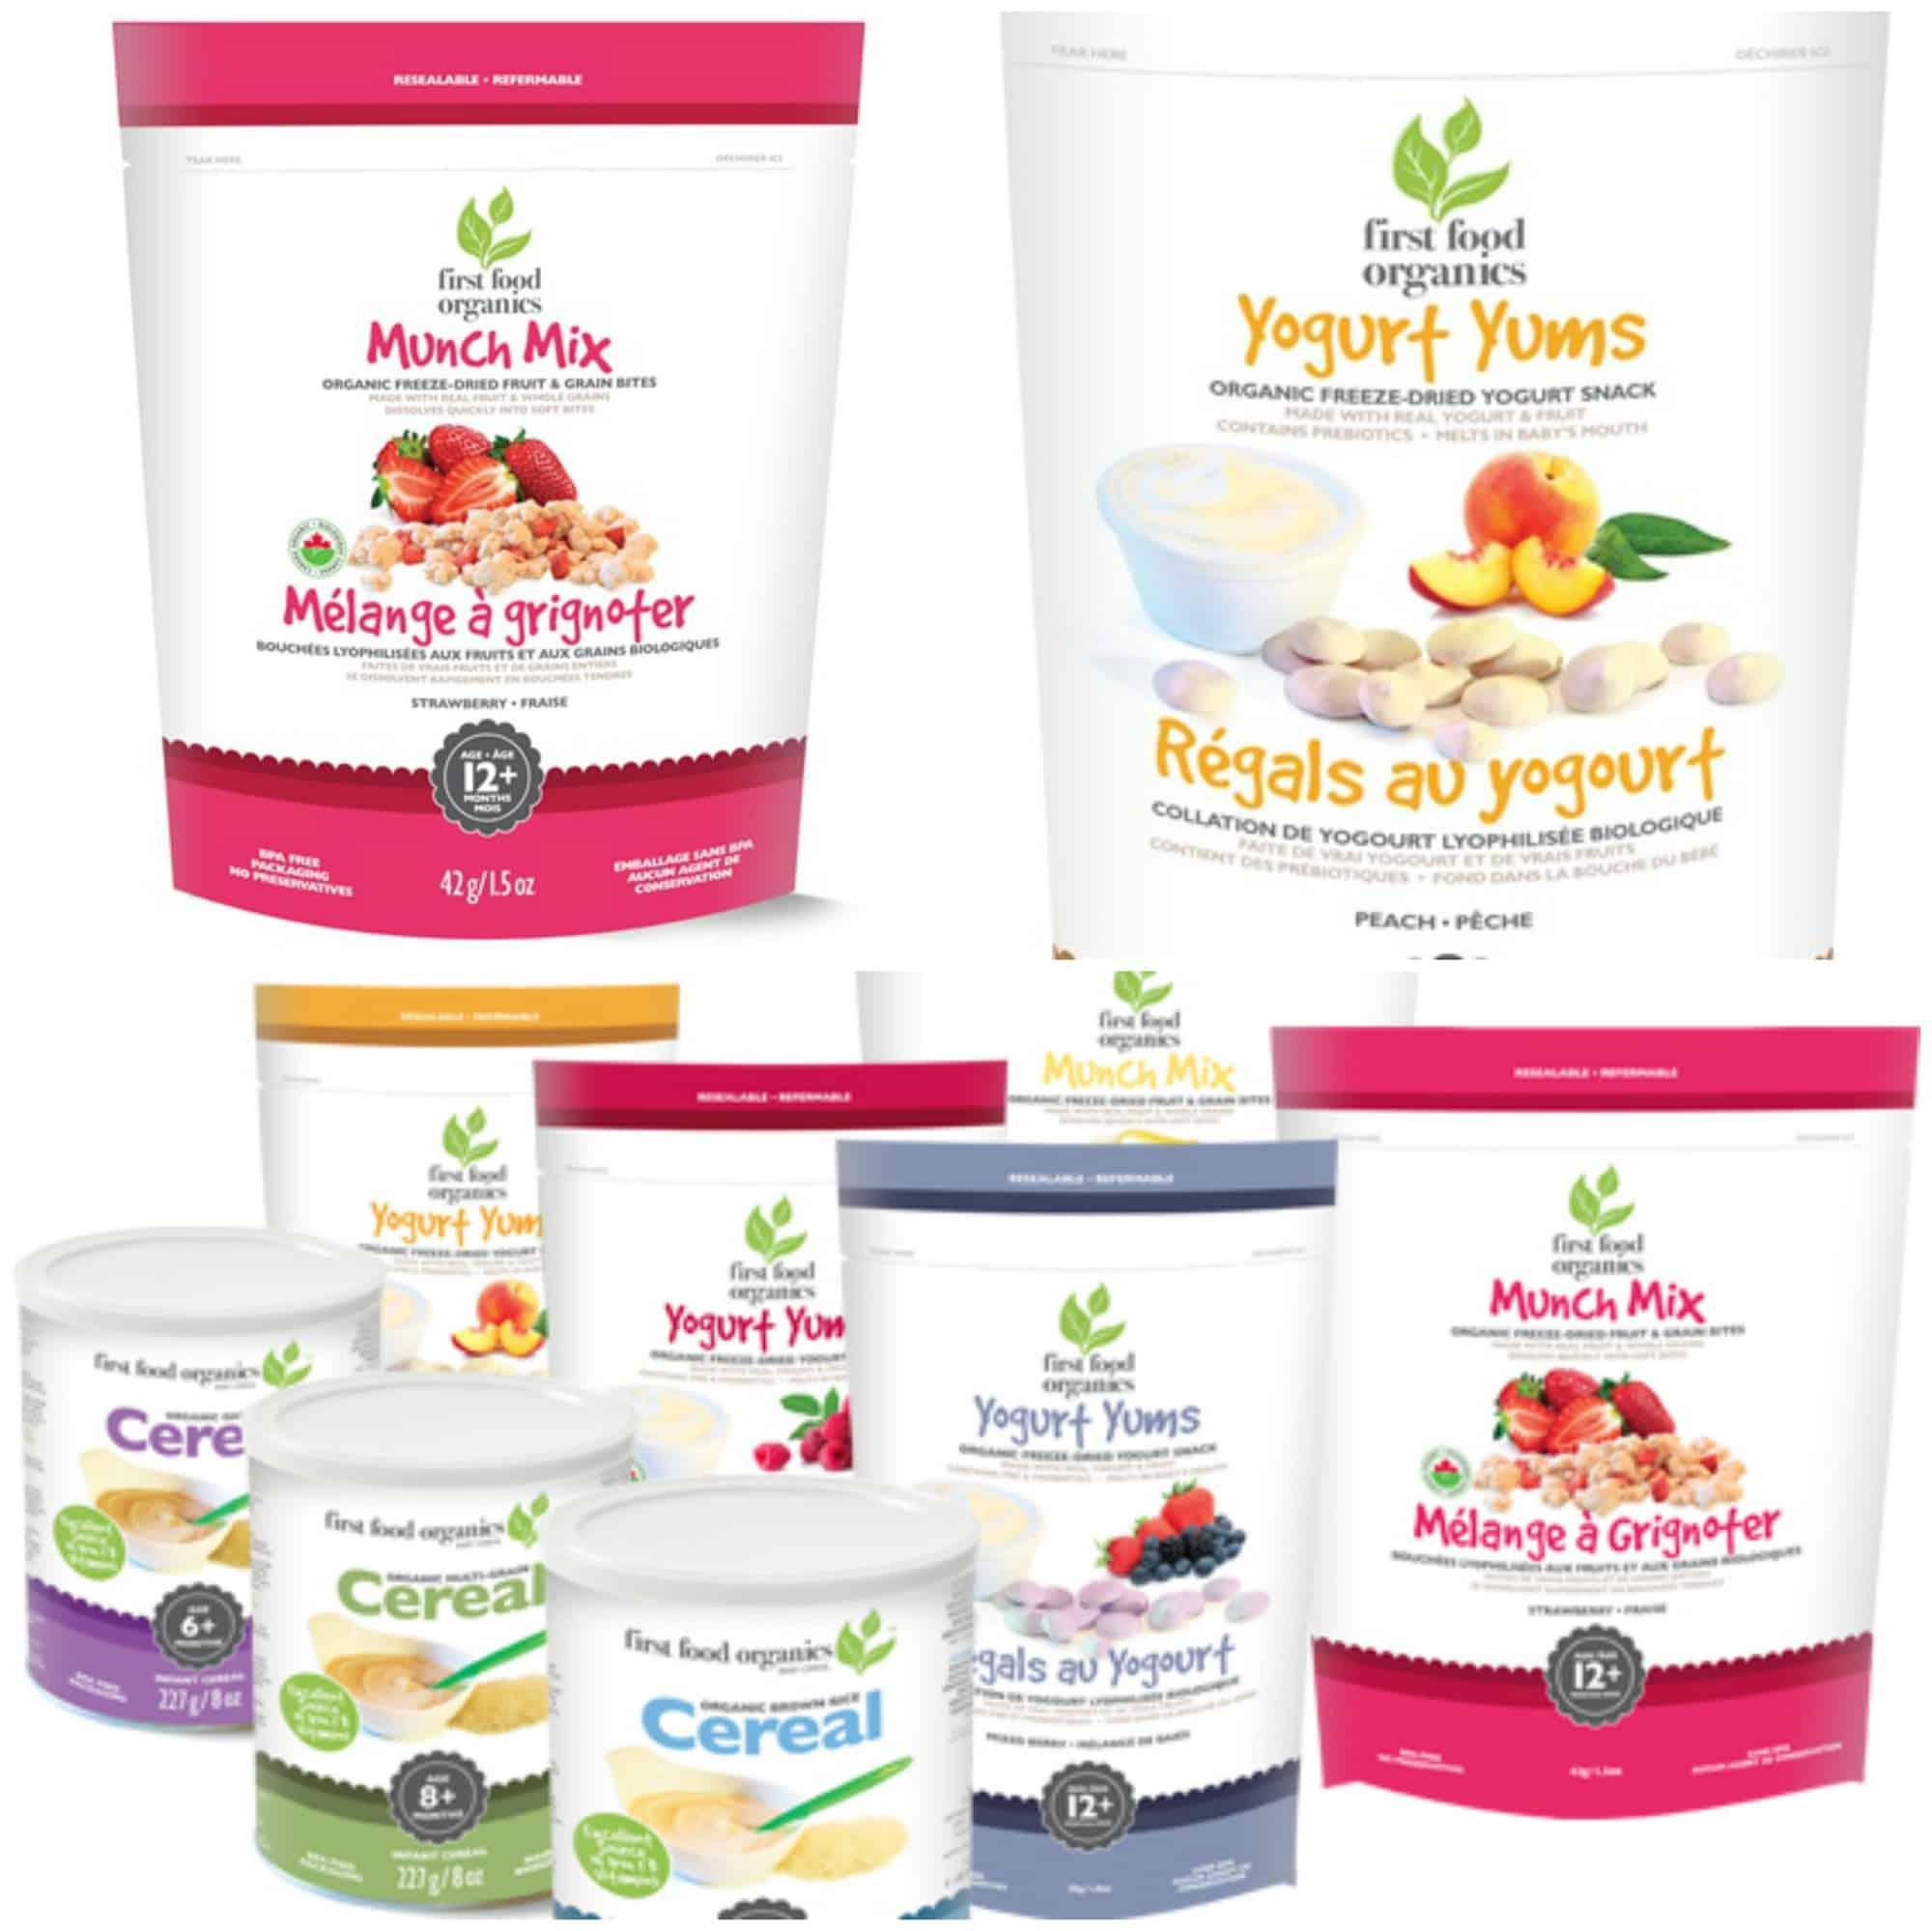 snacks for toddlers first food organics munch mix yogurt yums